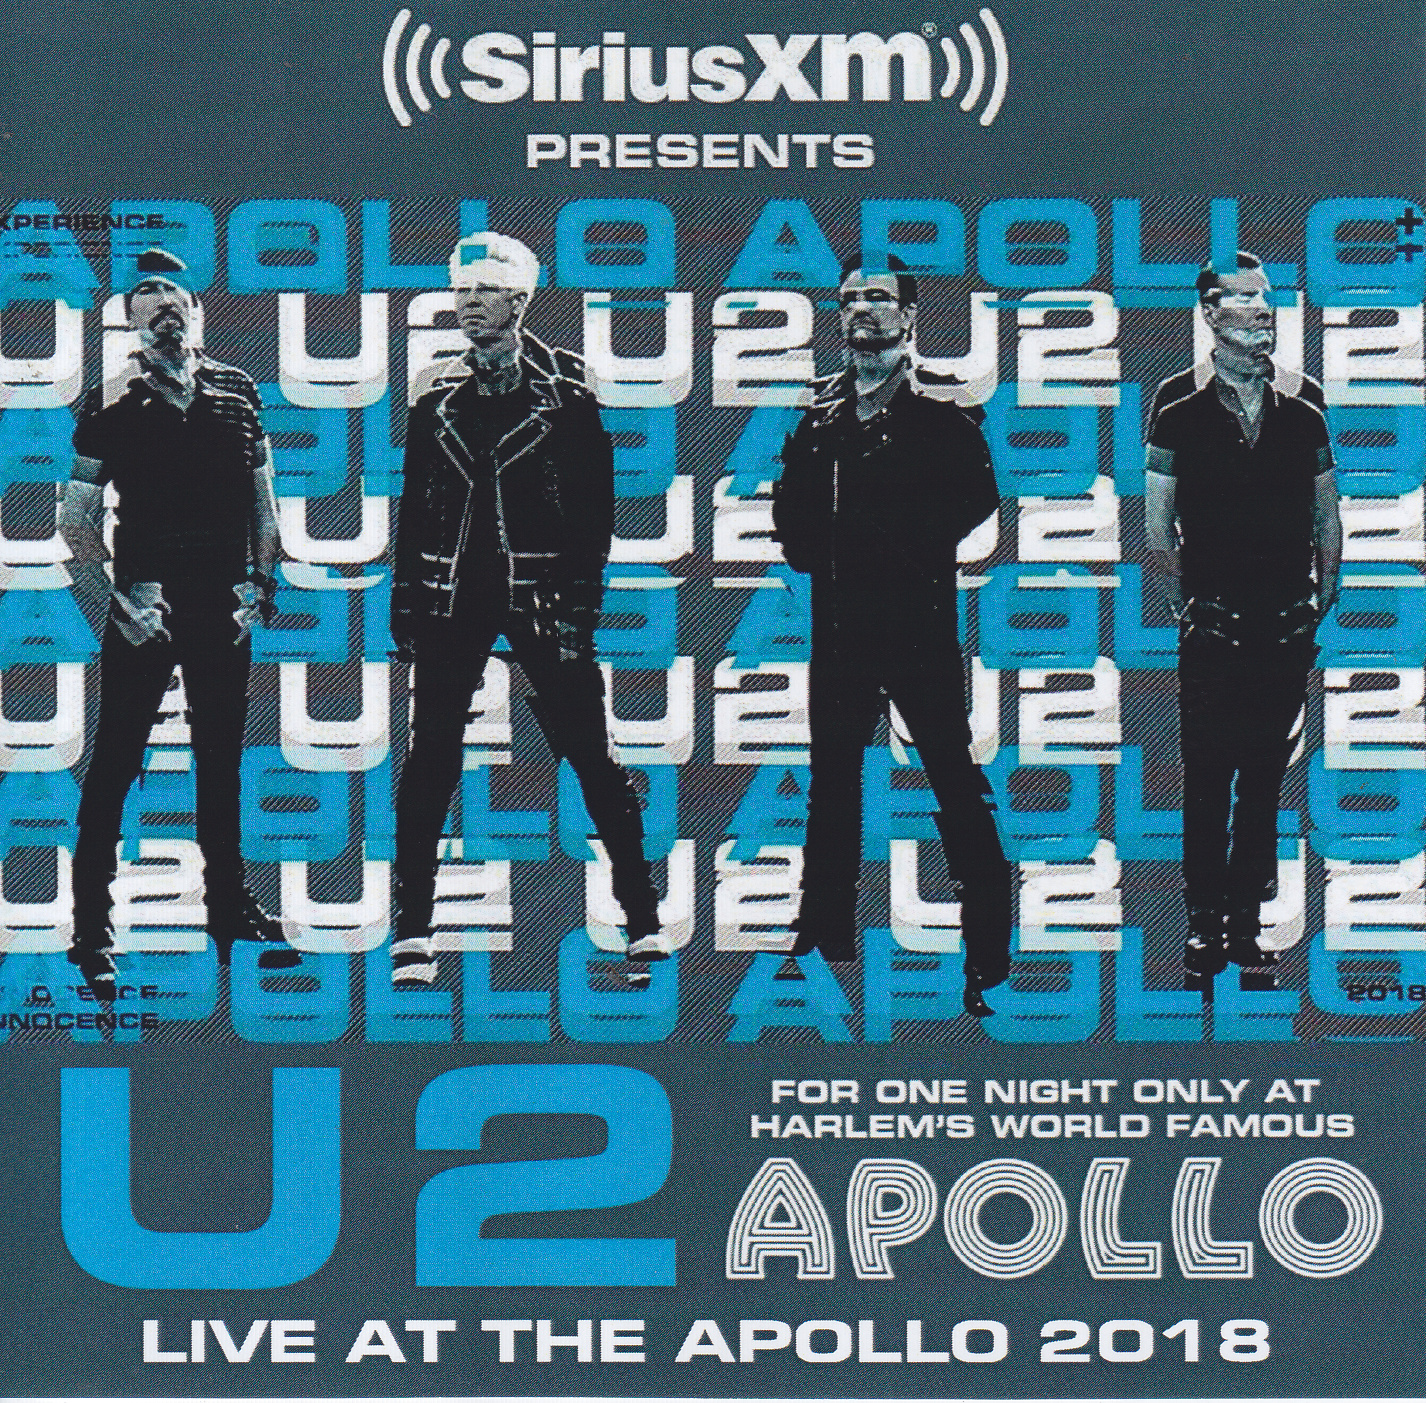 U2 / Live At The Apollo 2018 /2CDR – GiGinJapan